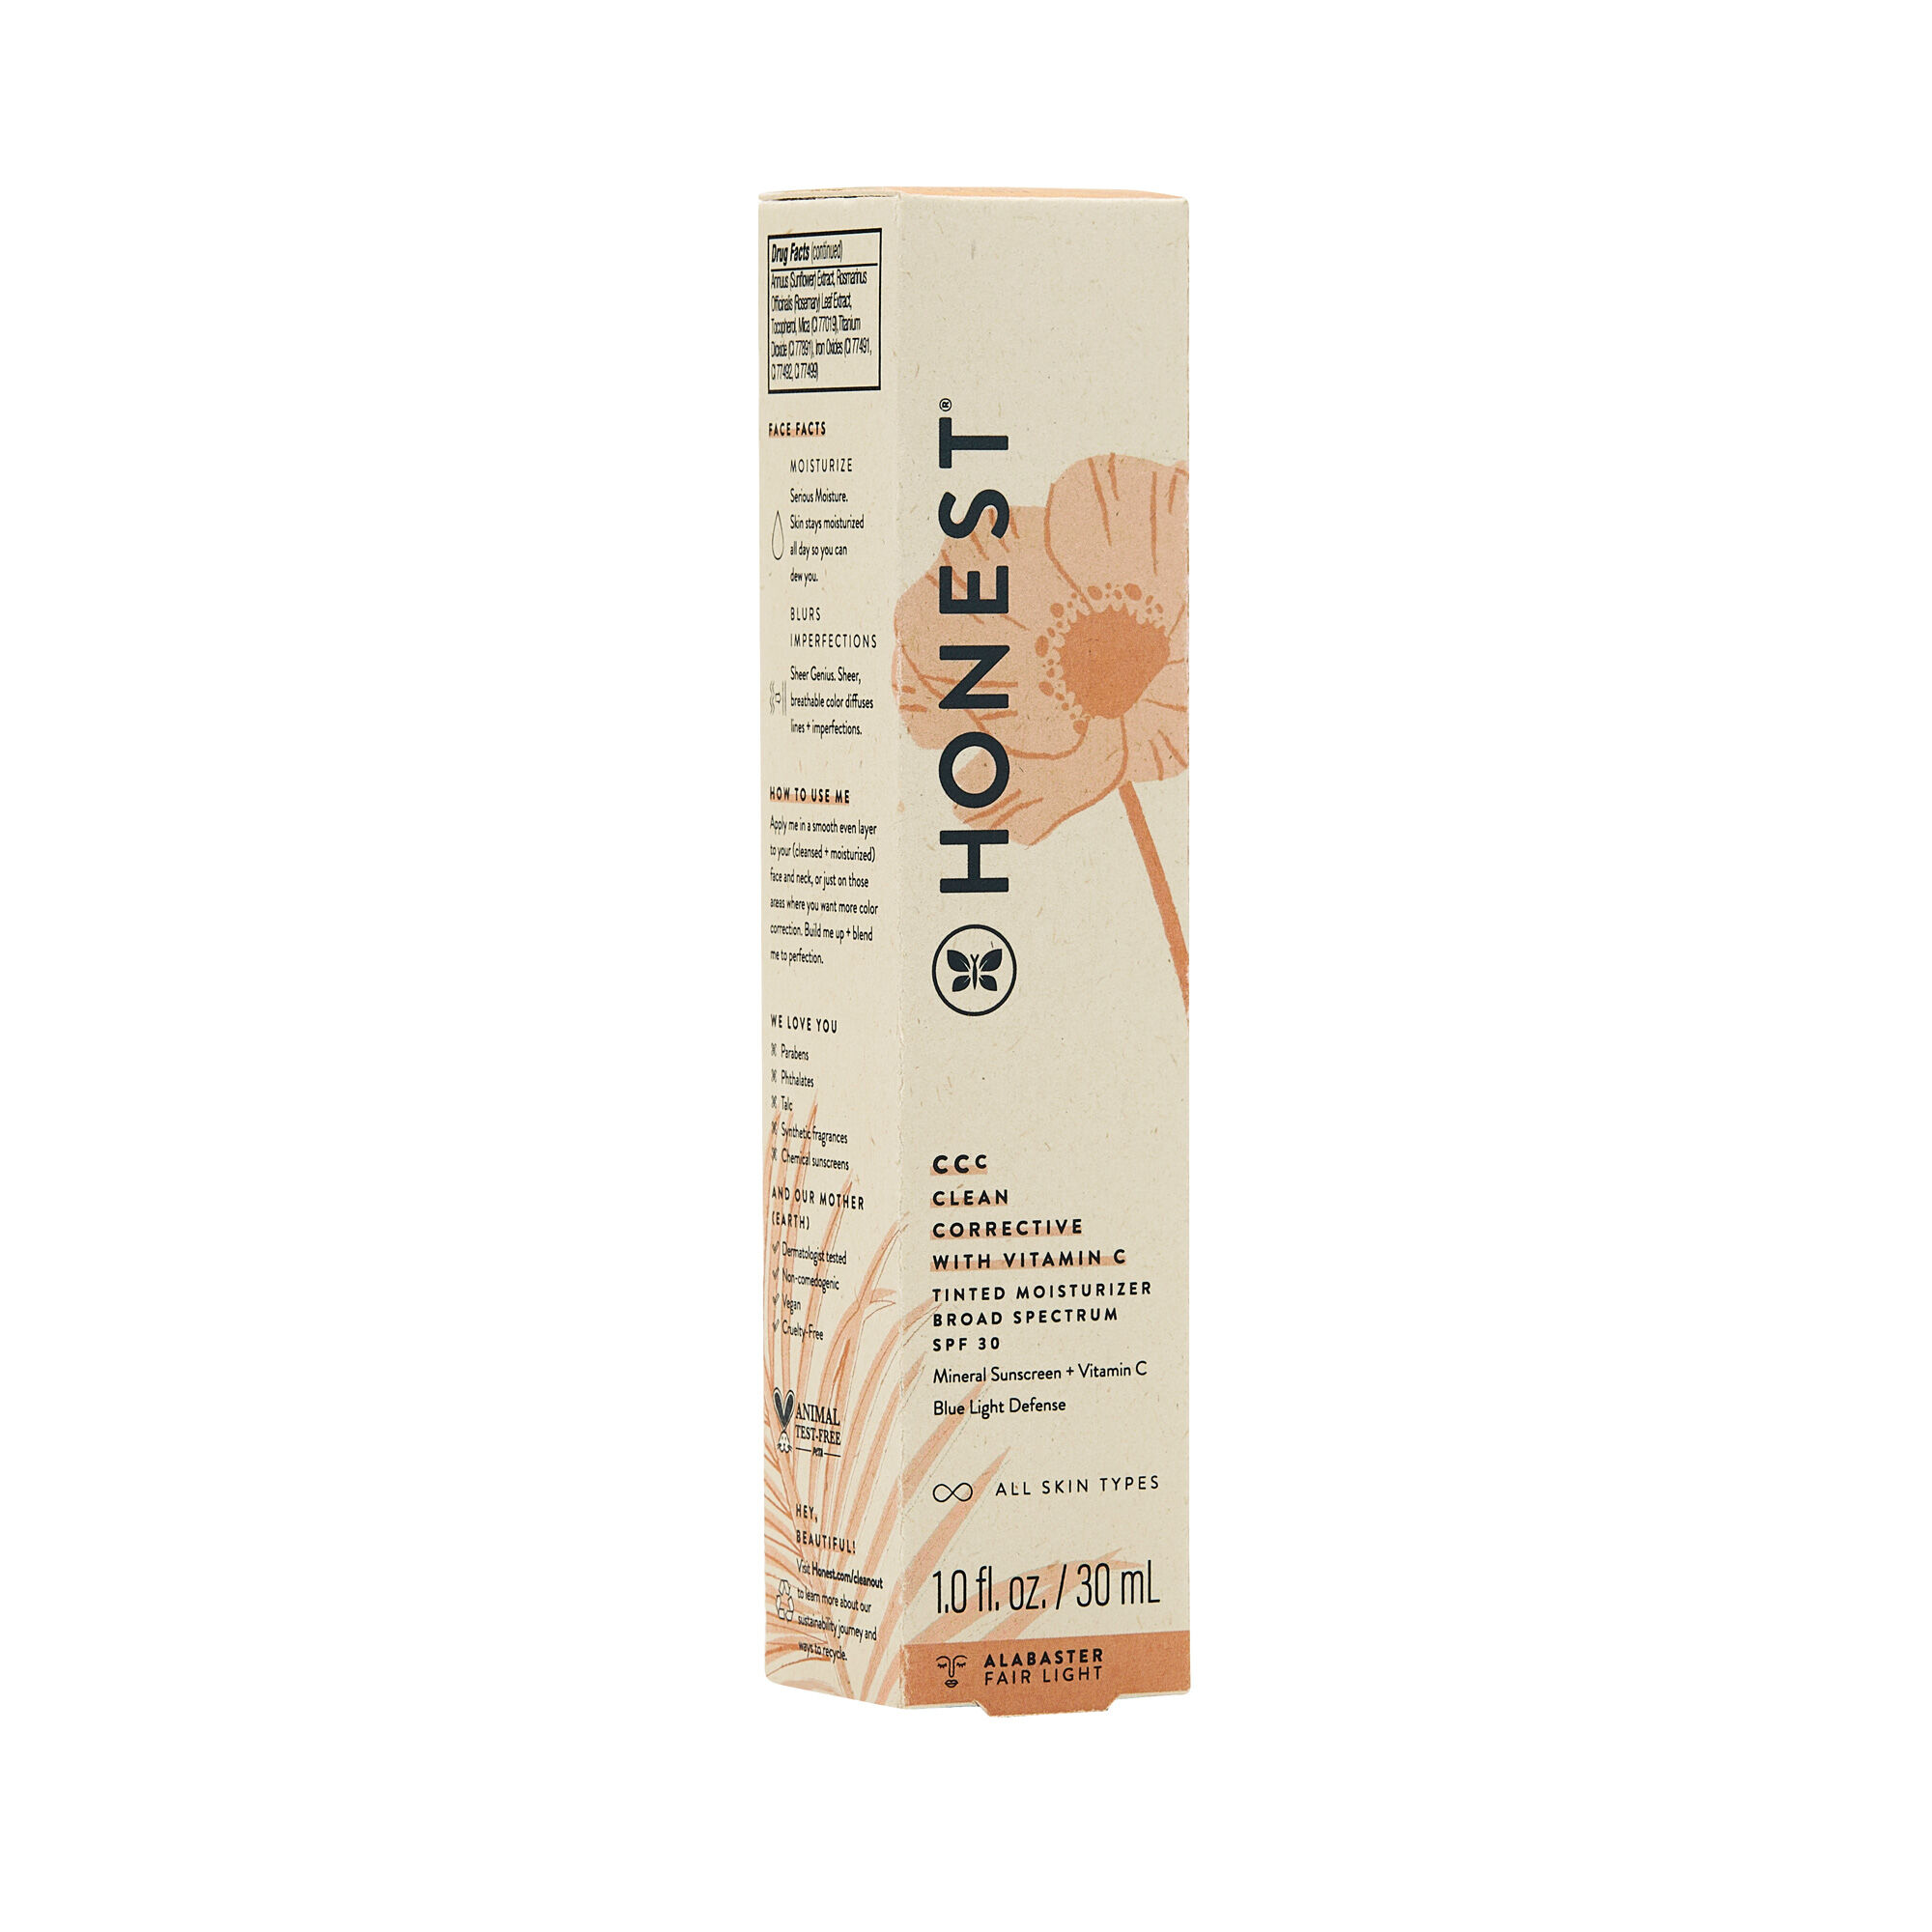 CCC Clean Corrective With Vitamin C Tinted Moisturizer Broad Spectrum SPF 30, Alabaster